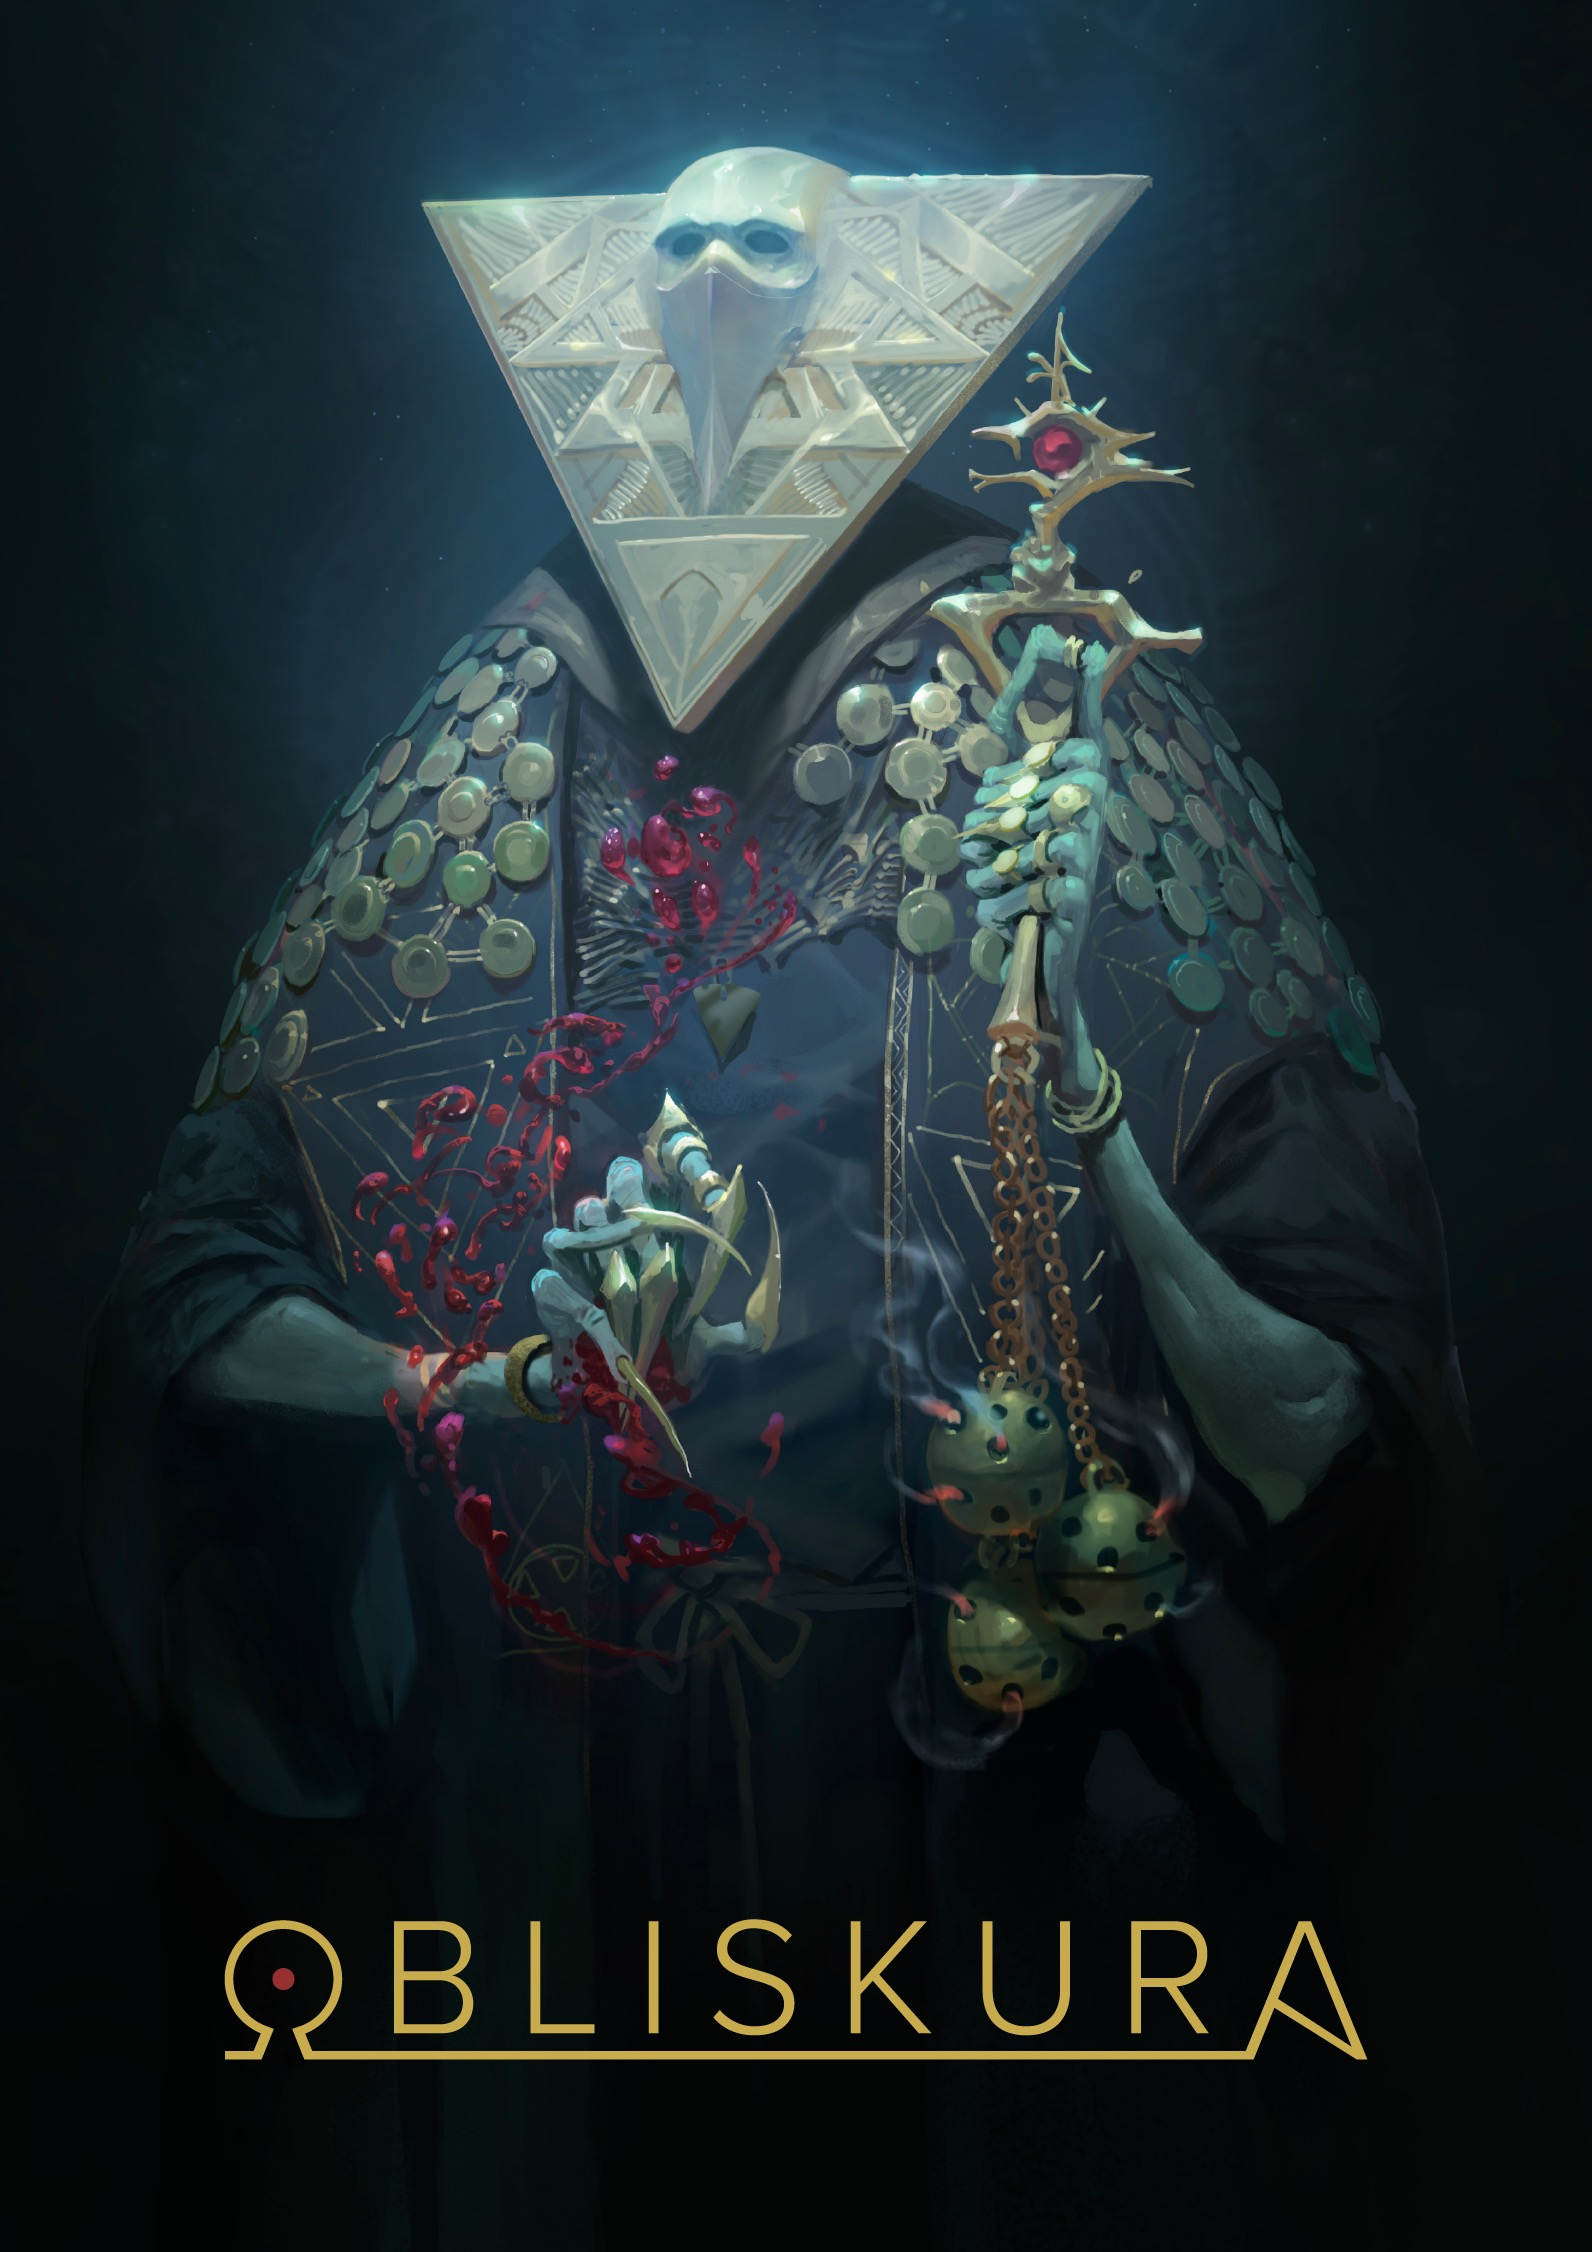 Couverture d'Obliskura d'Alex Konstad.